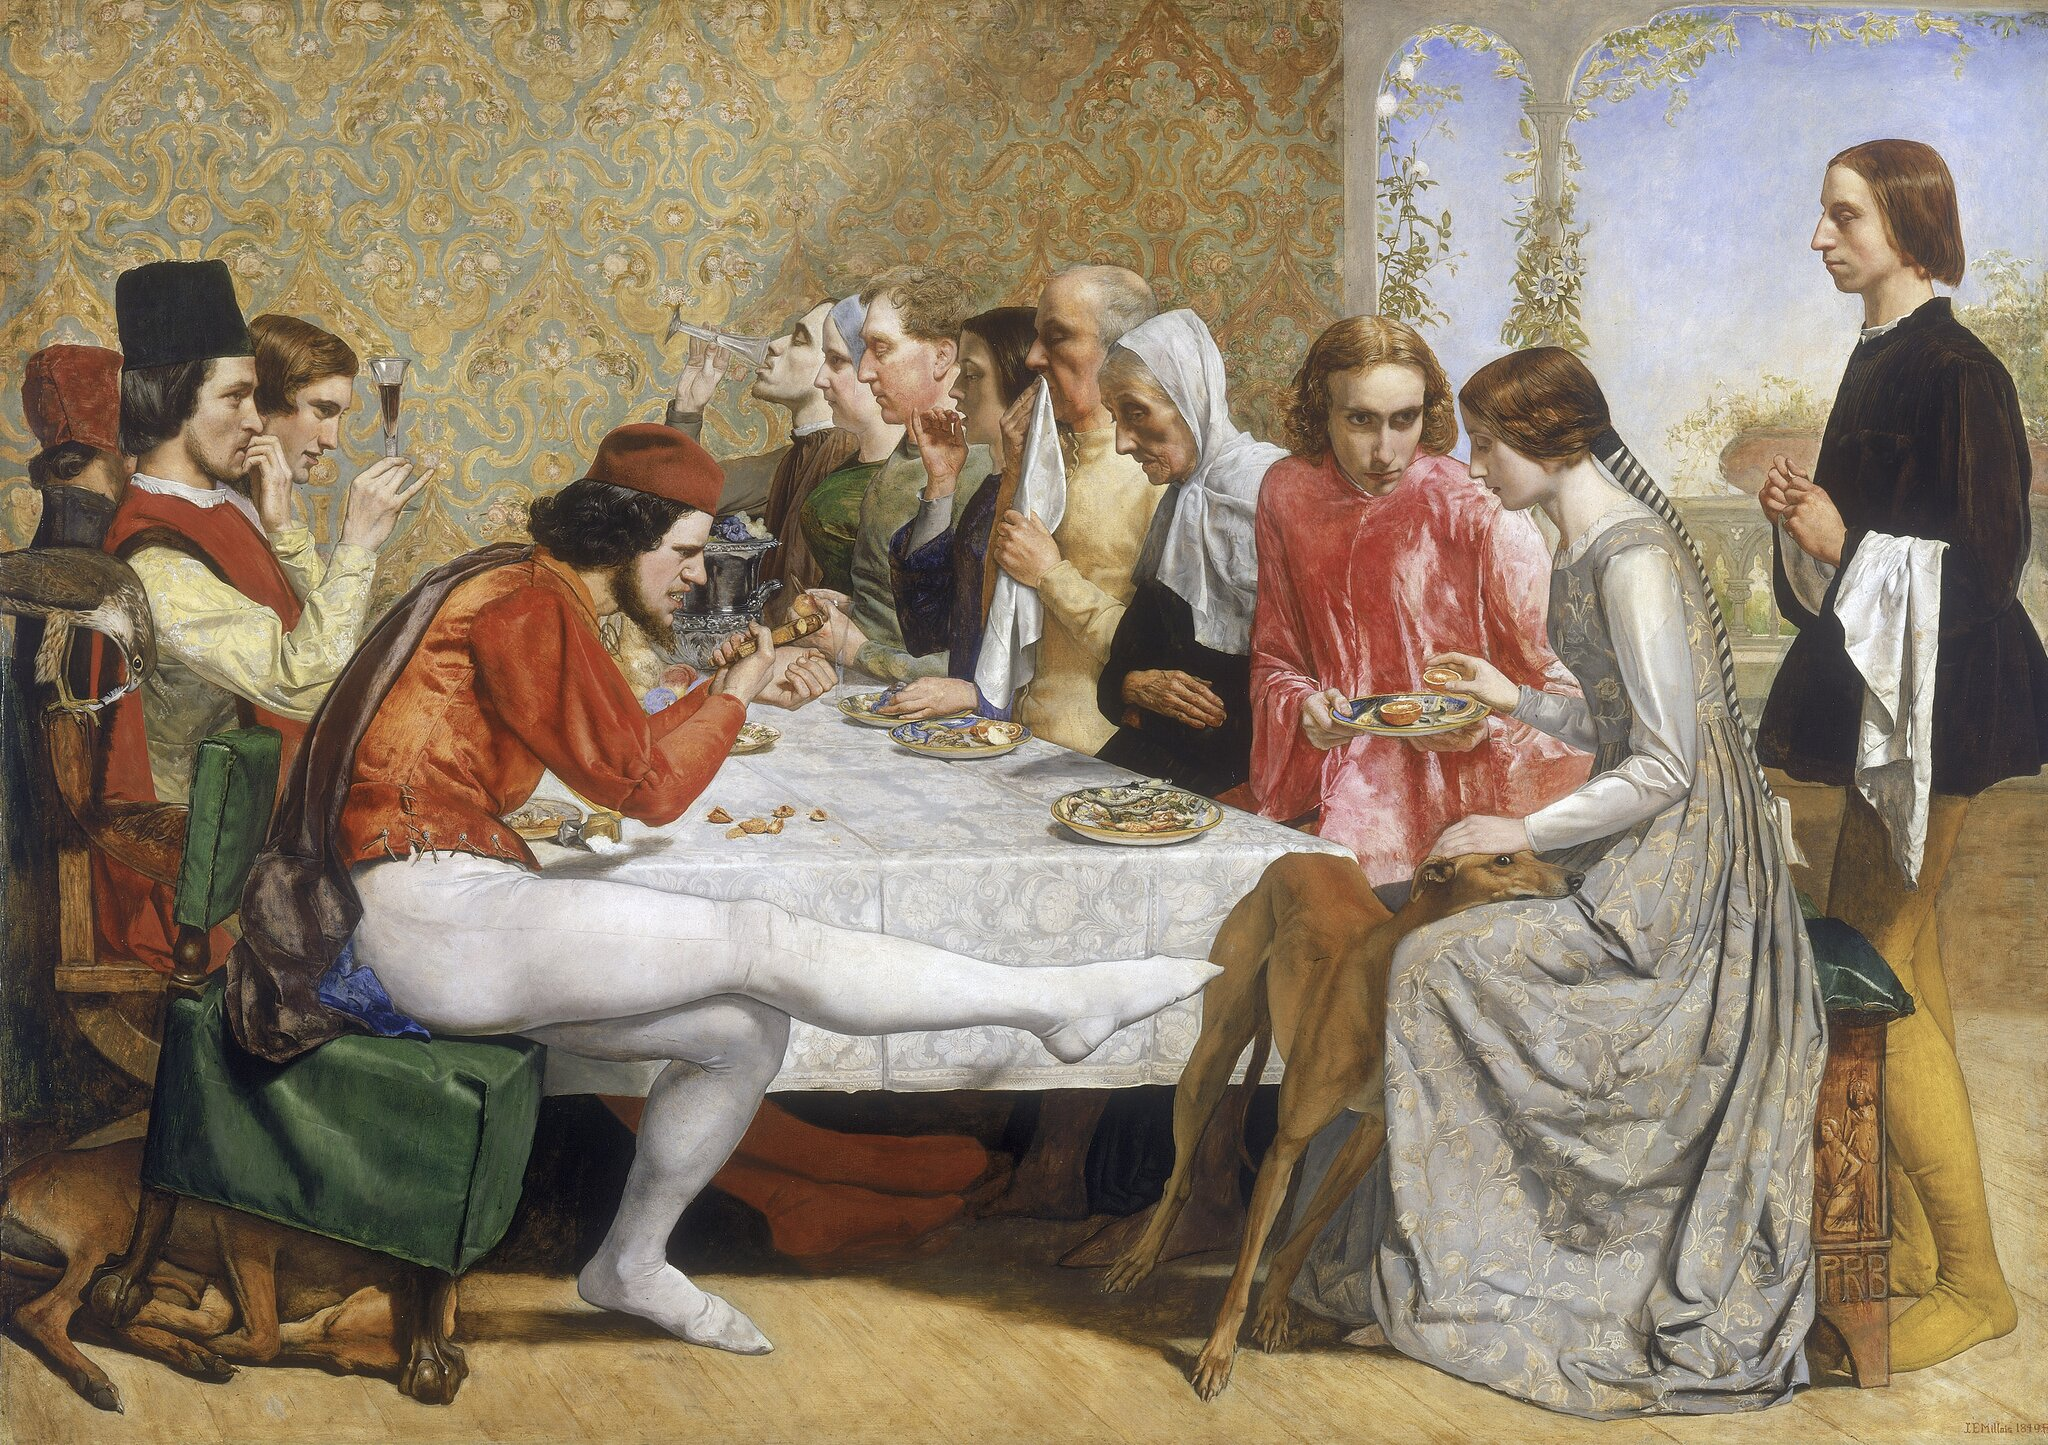 Isabella Źródło: John Everett Millais, Isabella, 1849, Walker Art Gallery, Anglia, domena publiczna.